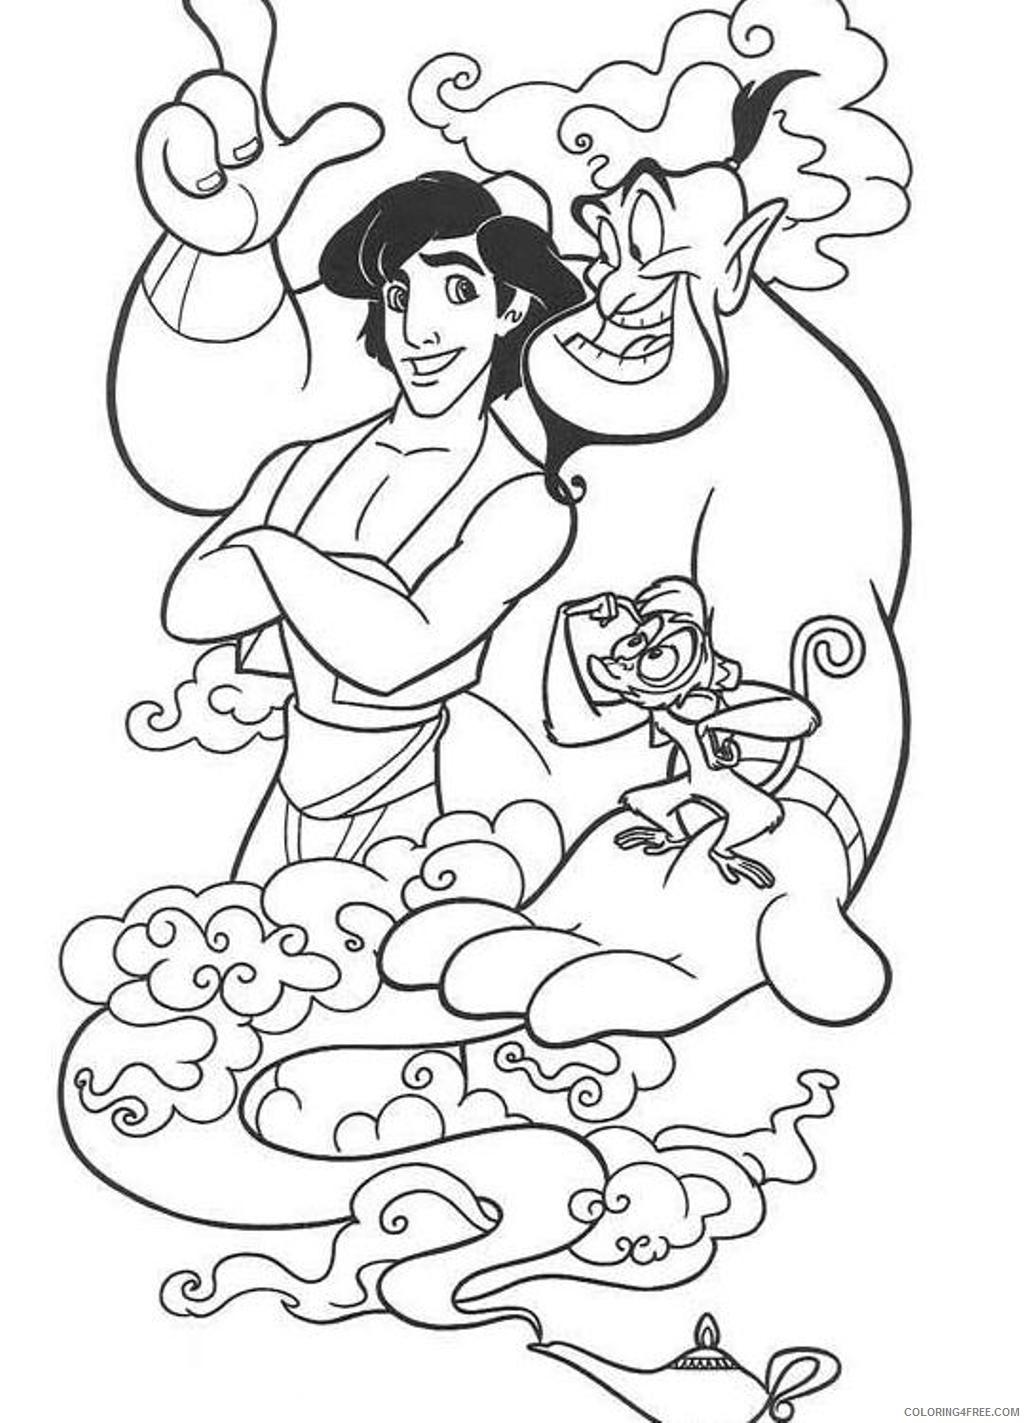 aladdin coloring pages aladdin abu genie Coloring4free